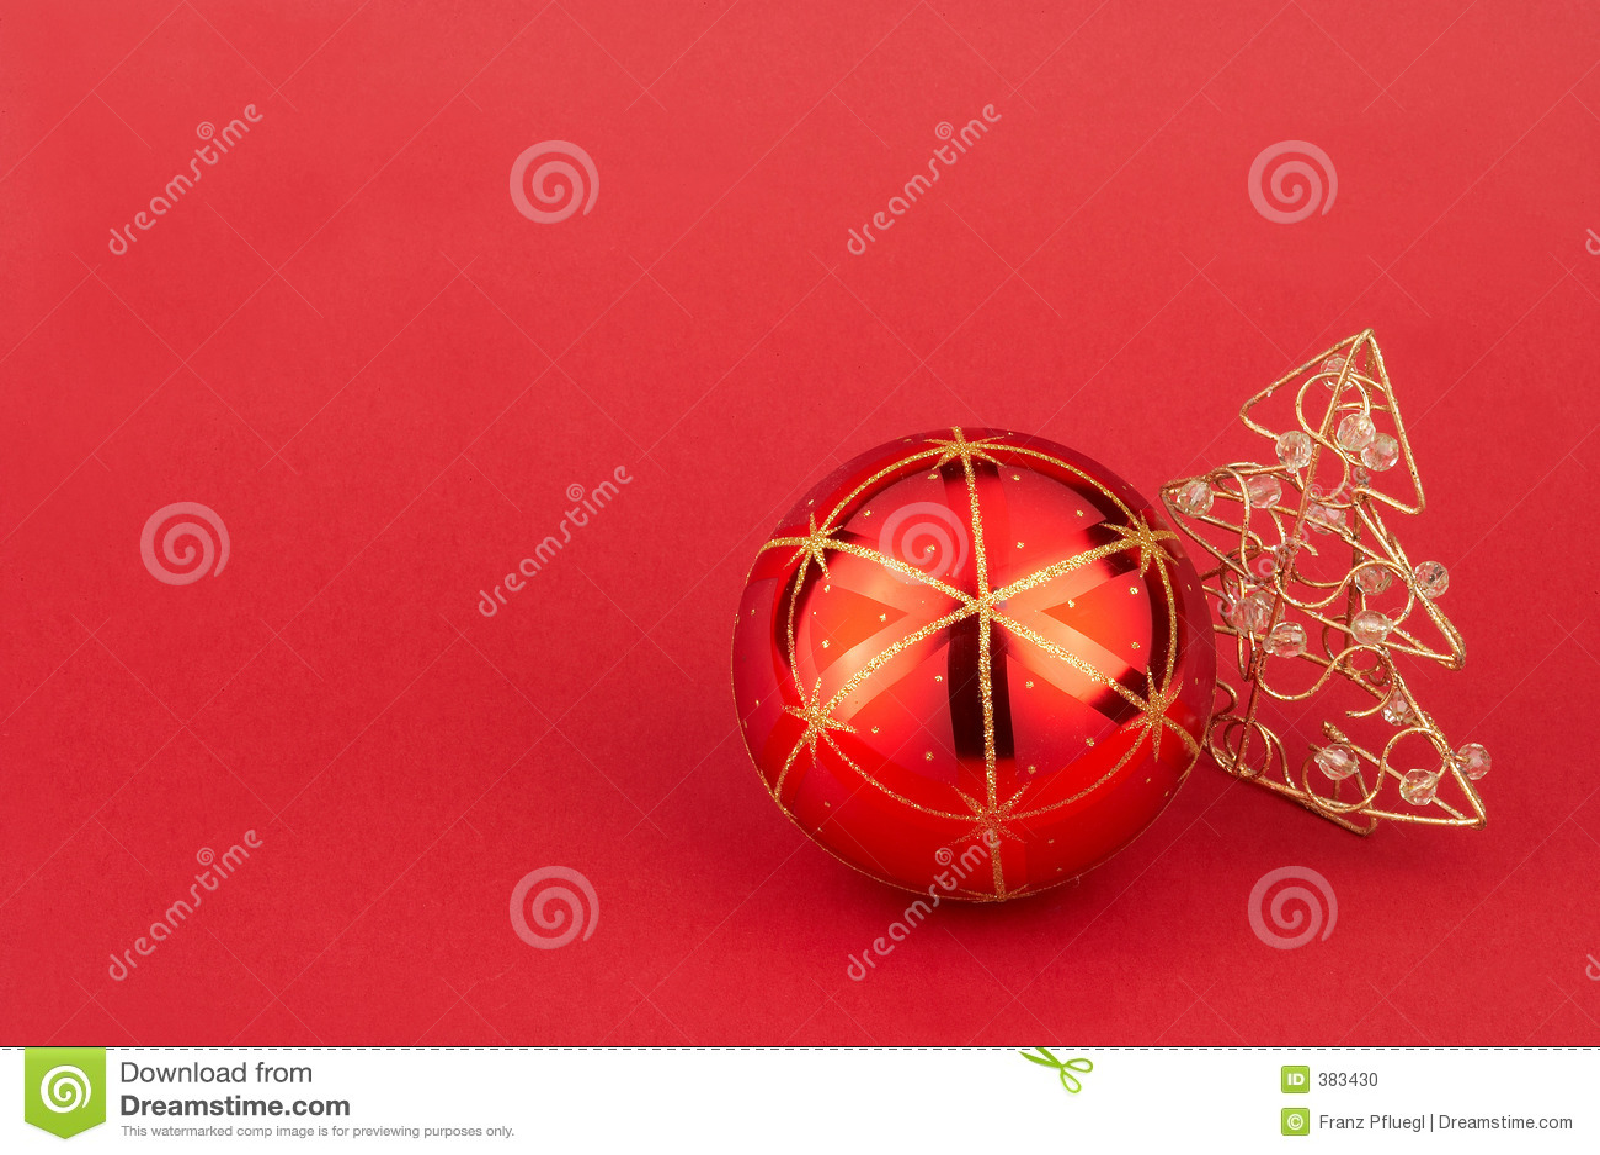 red christmas tree ball and christmas tree - rote Weihnachtskugel mit goldenem Weihnachtsbaum